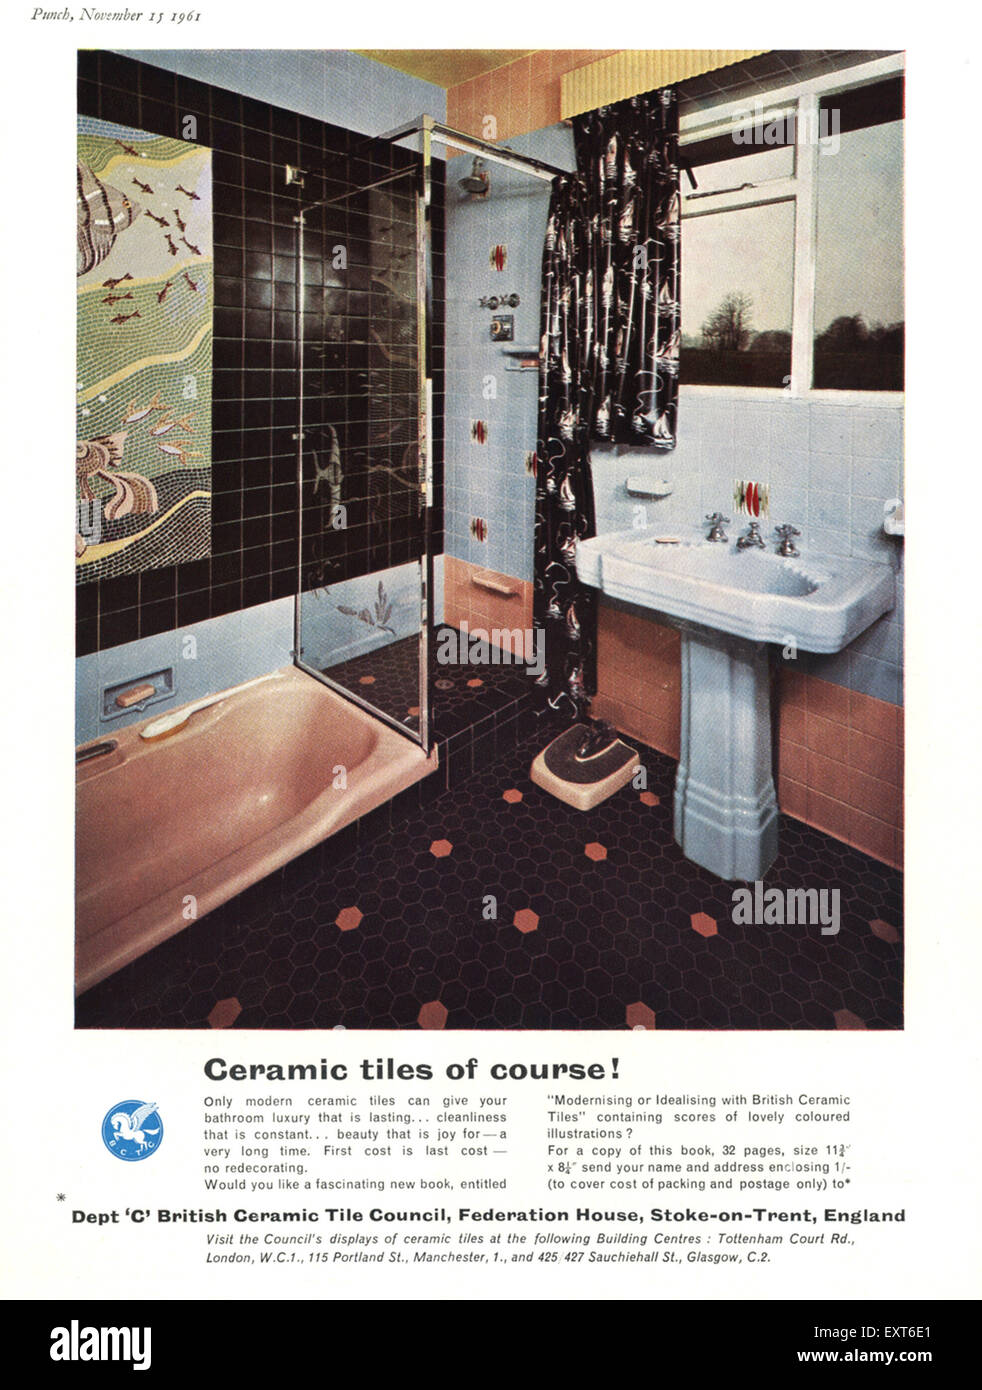 1960s uk british ceramic tile council magazine advert stock photo 1960s uk british ceramic tile council magazine advert dailygadgetfo Image collections